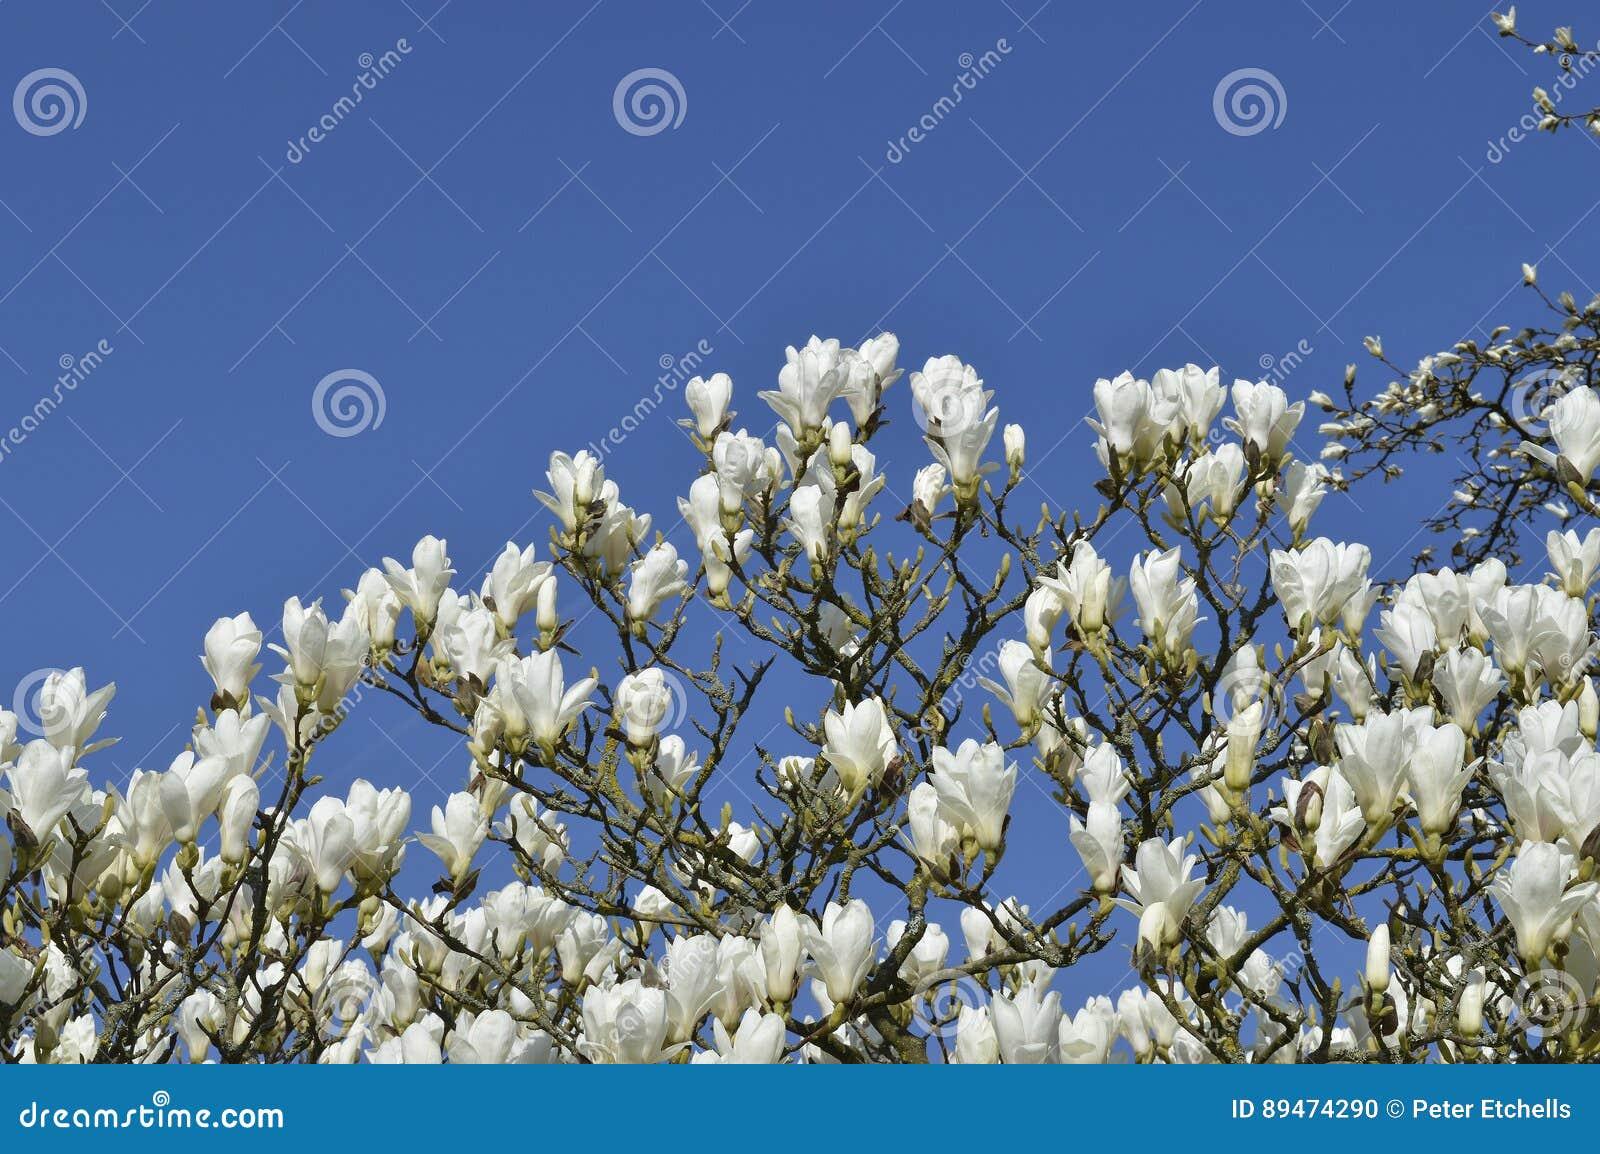 Magnolia Tree White Flowers Stock Photo Image Of Blossom Denudata